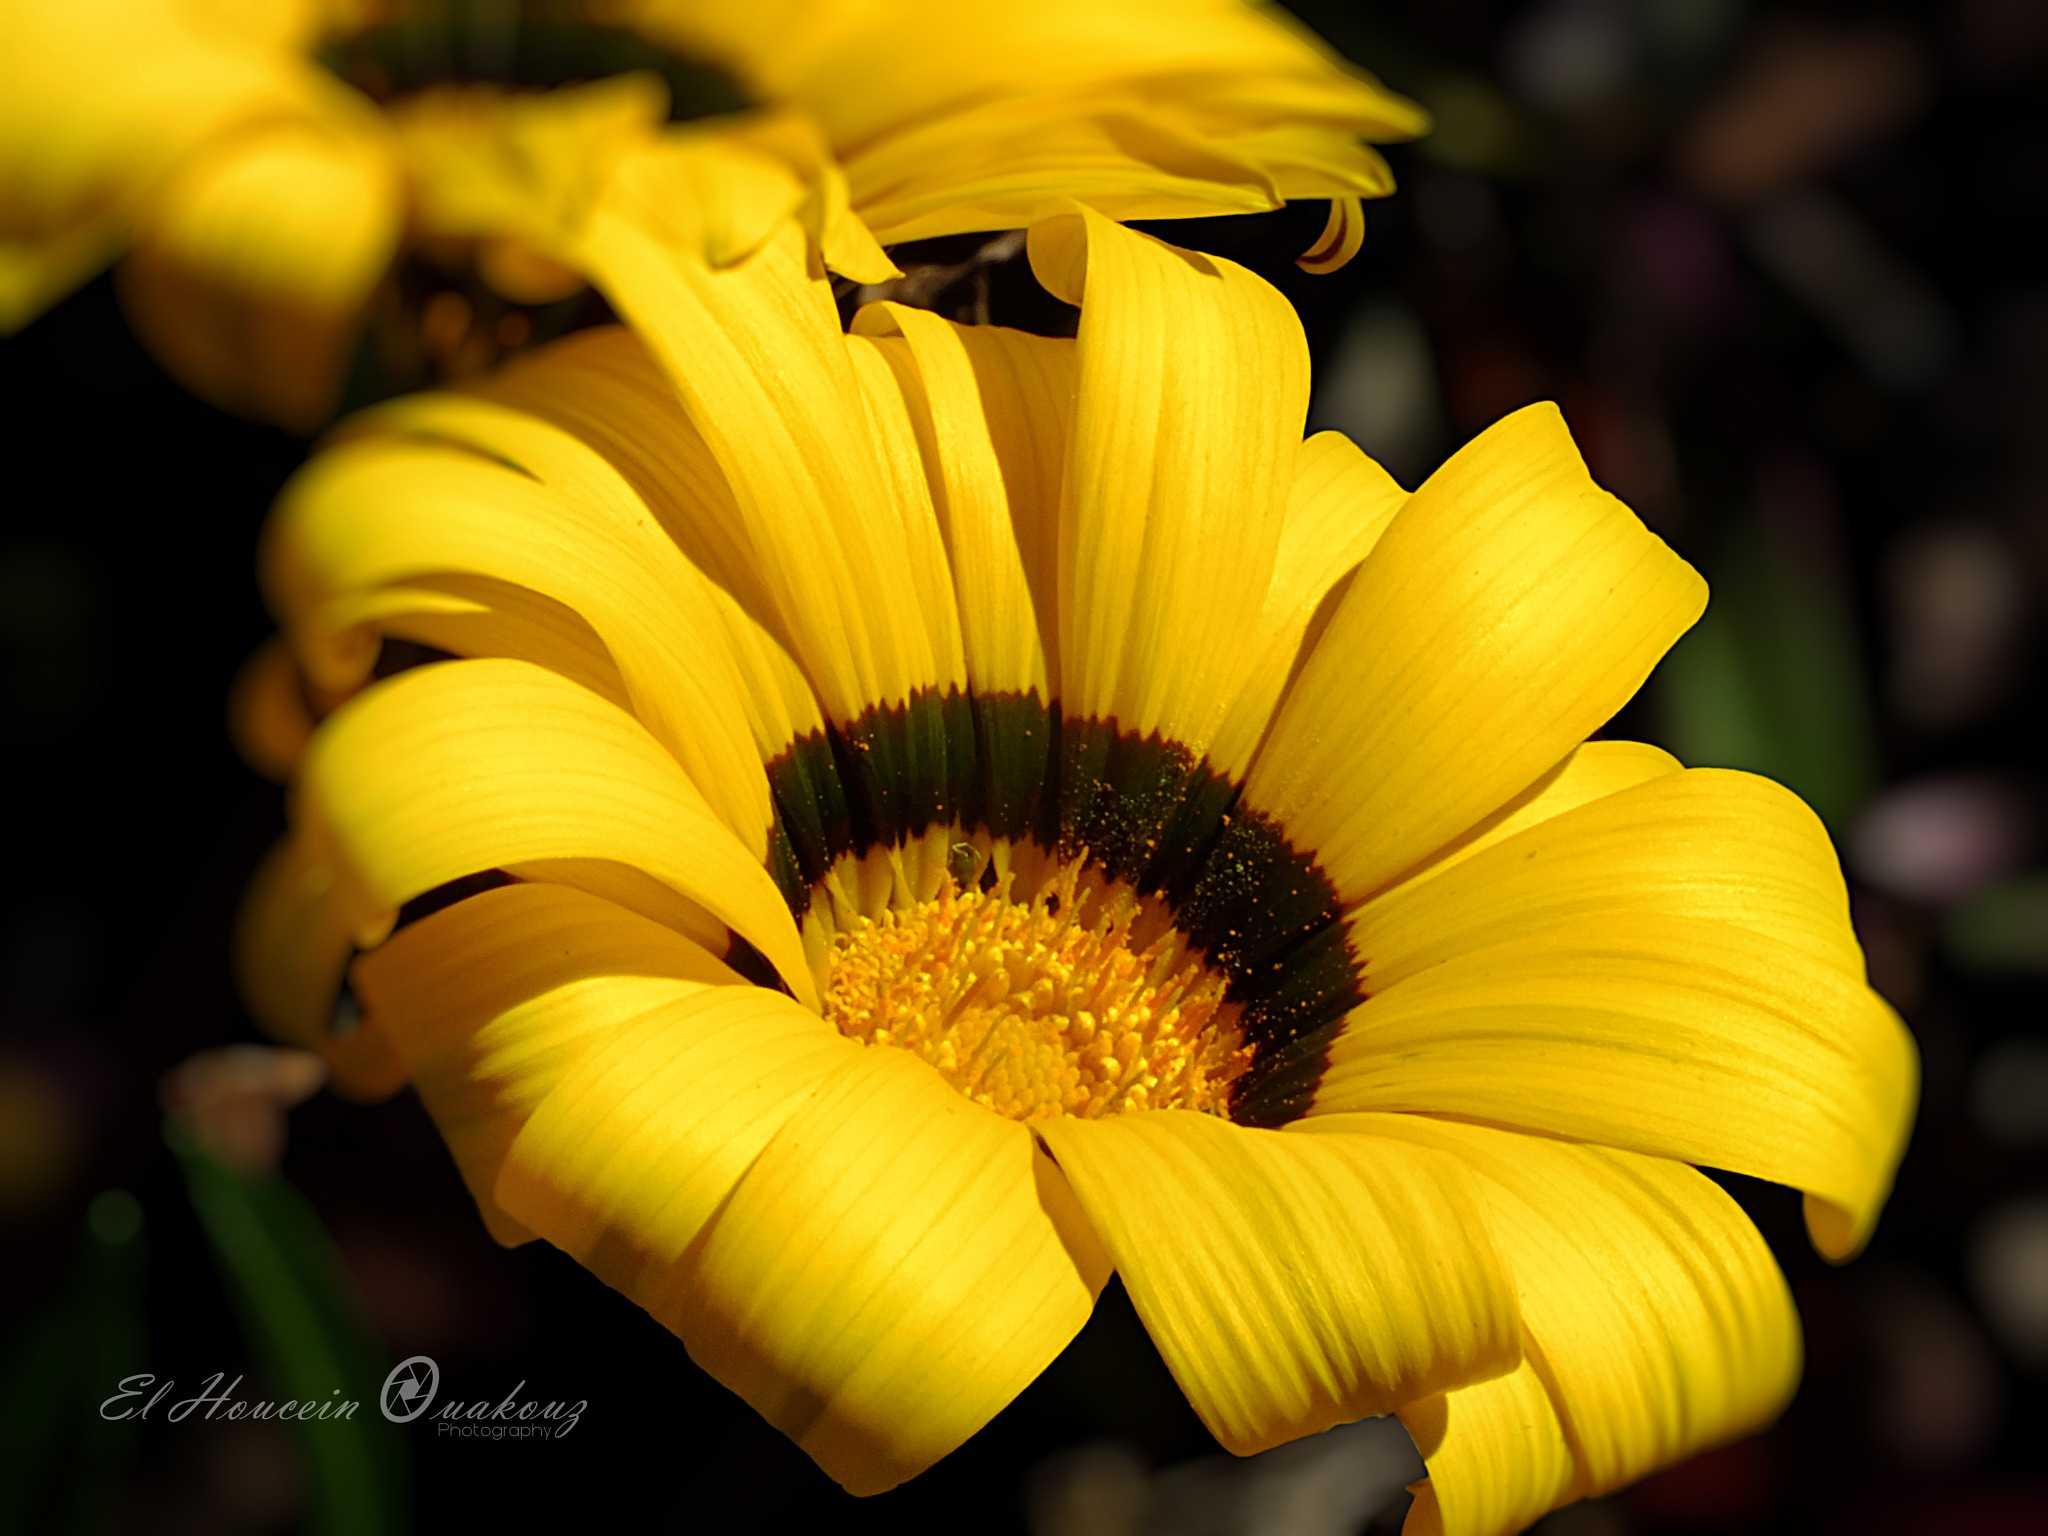 Yellow flower by El Houcein Ouakouz